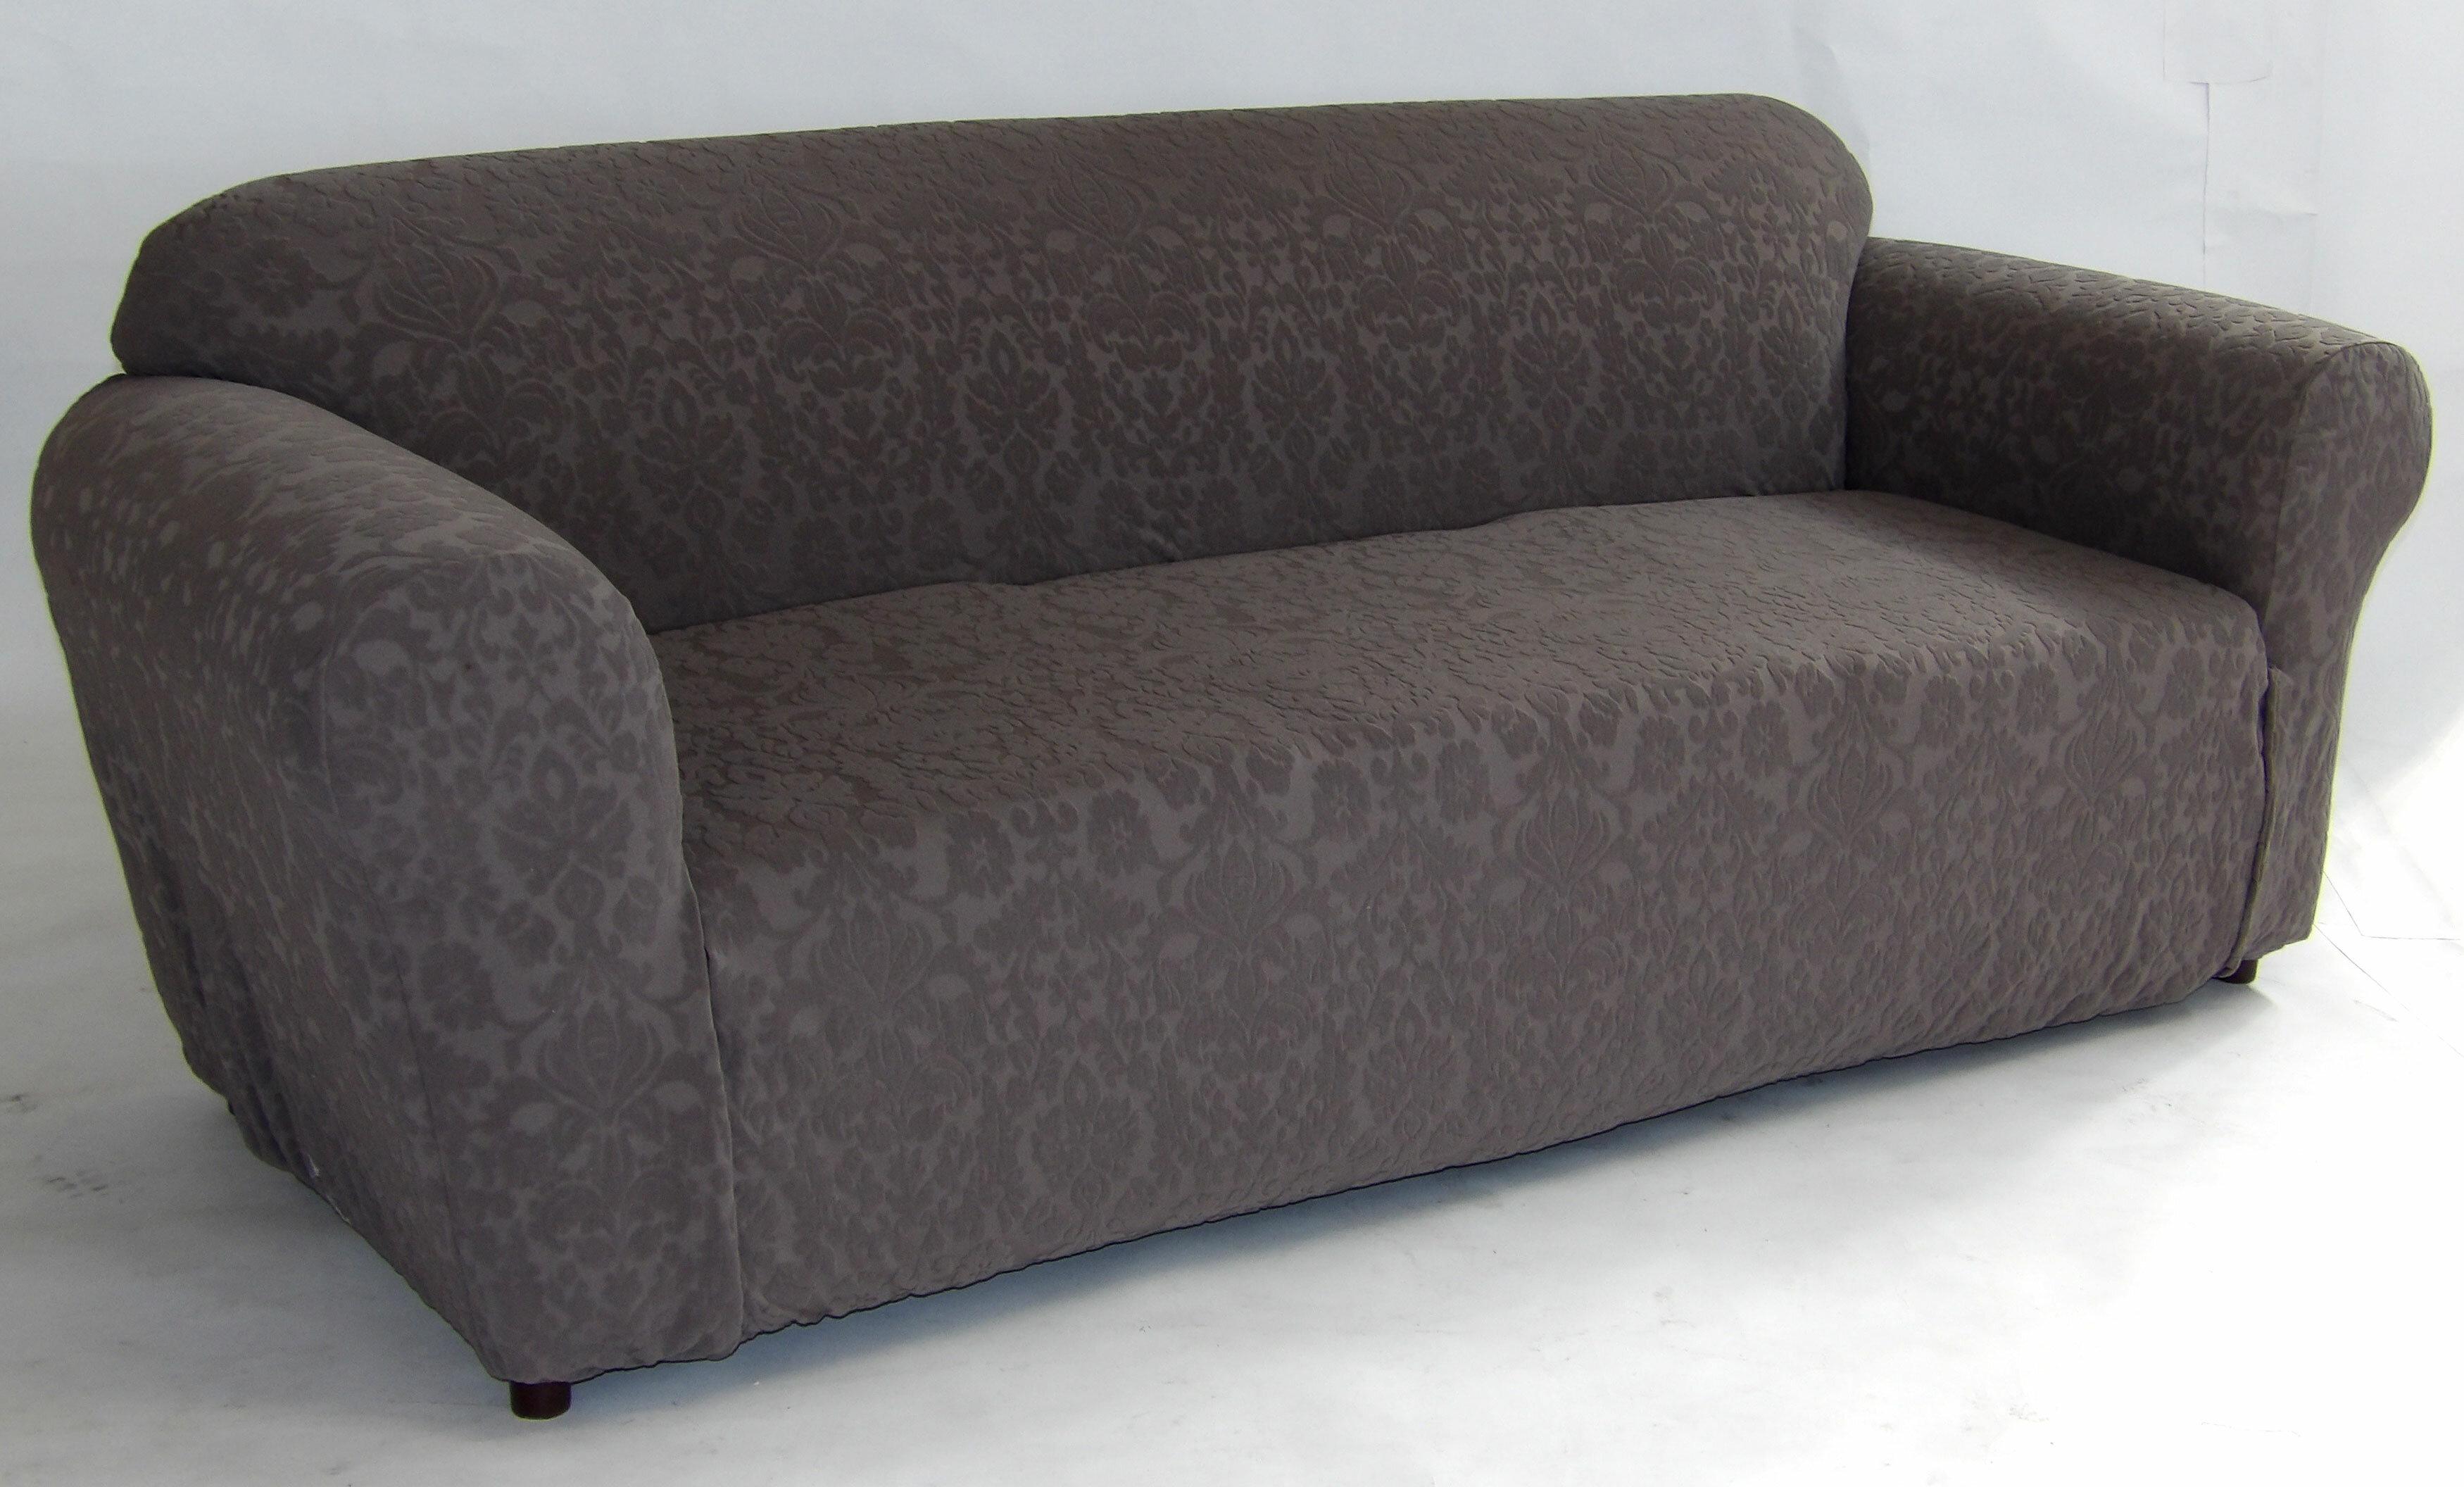 Beau Stretch Floral Box Cushion Sofa Slipcover